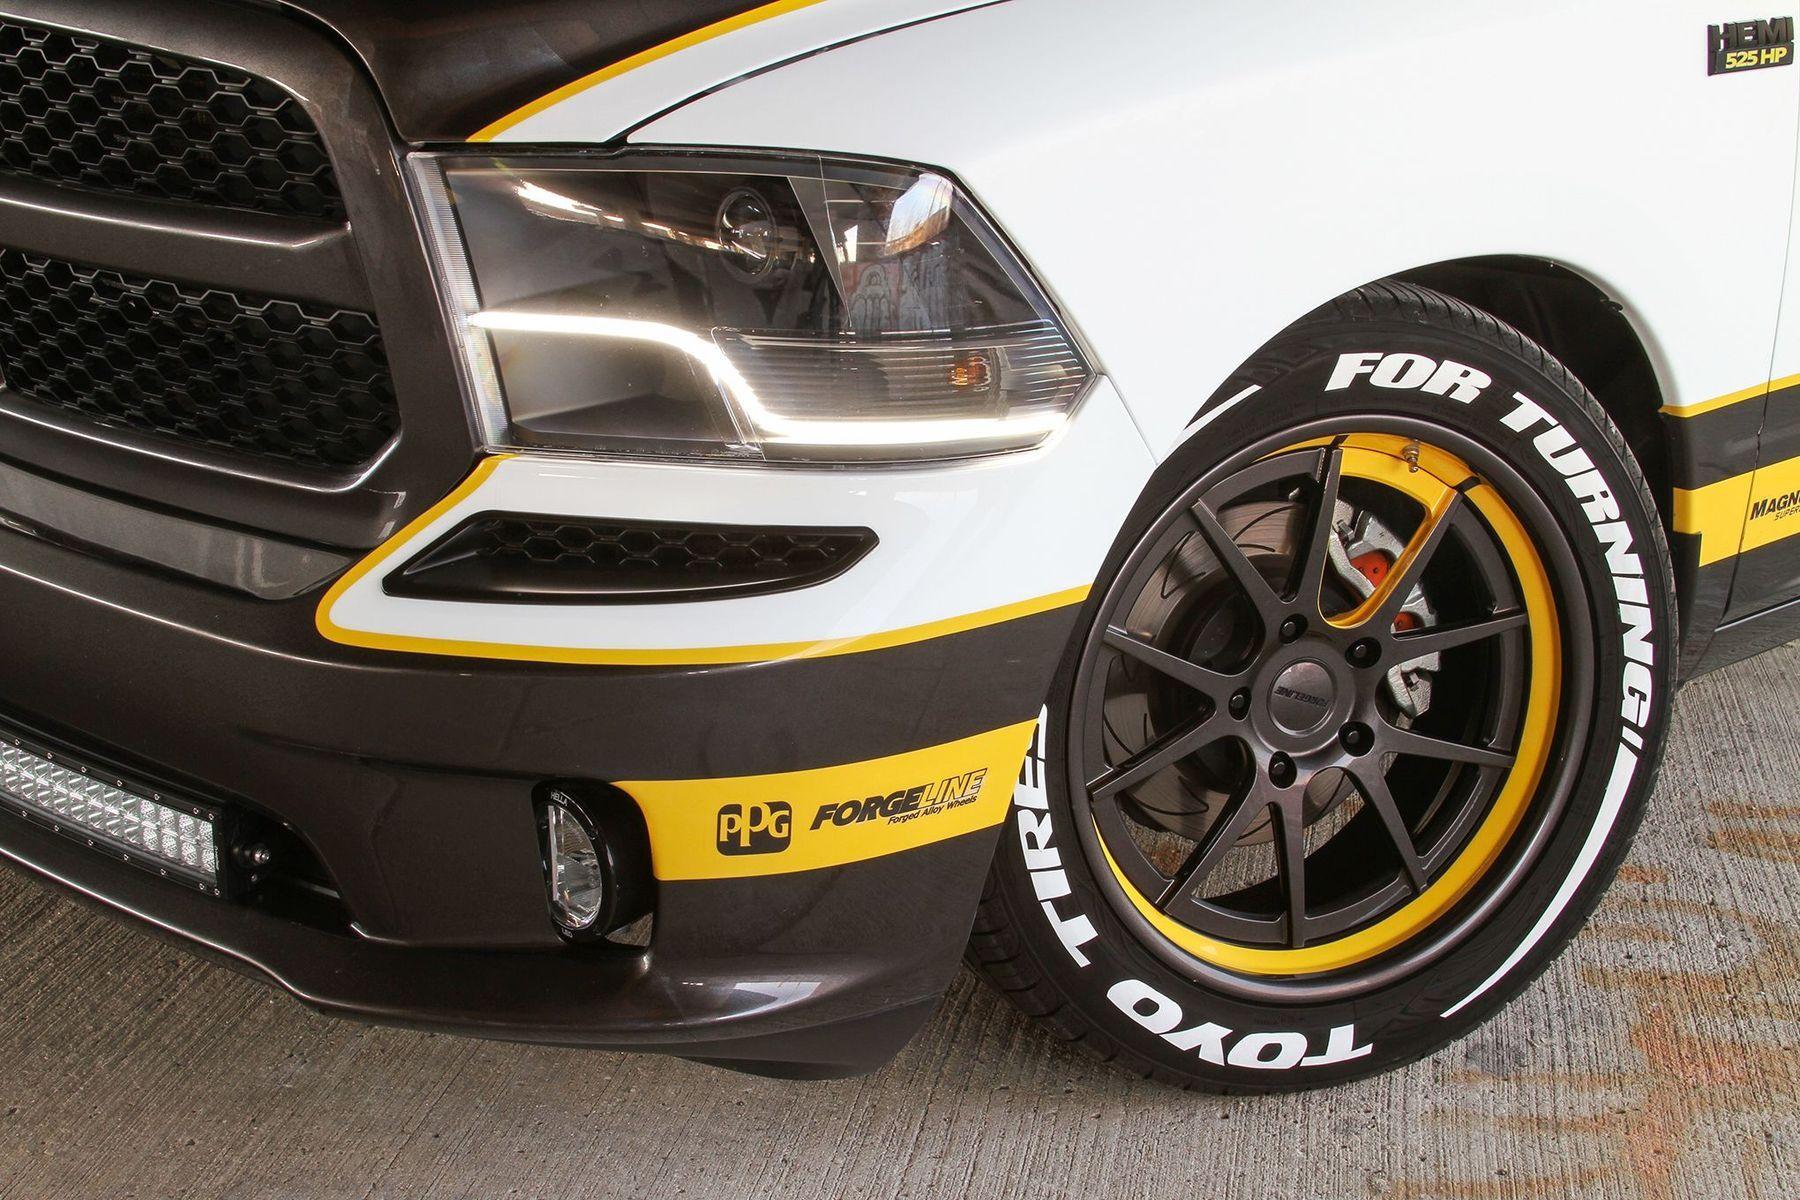 2015 Dodge Ram Pickup 1500   Pfaff Designs Supercharged Draggin Wagon Dodge Ram on Forgeline GA3C Concave Wheels